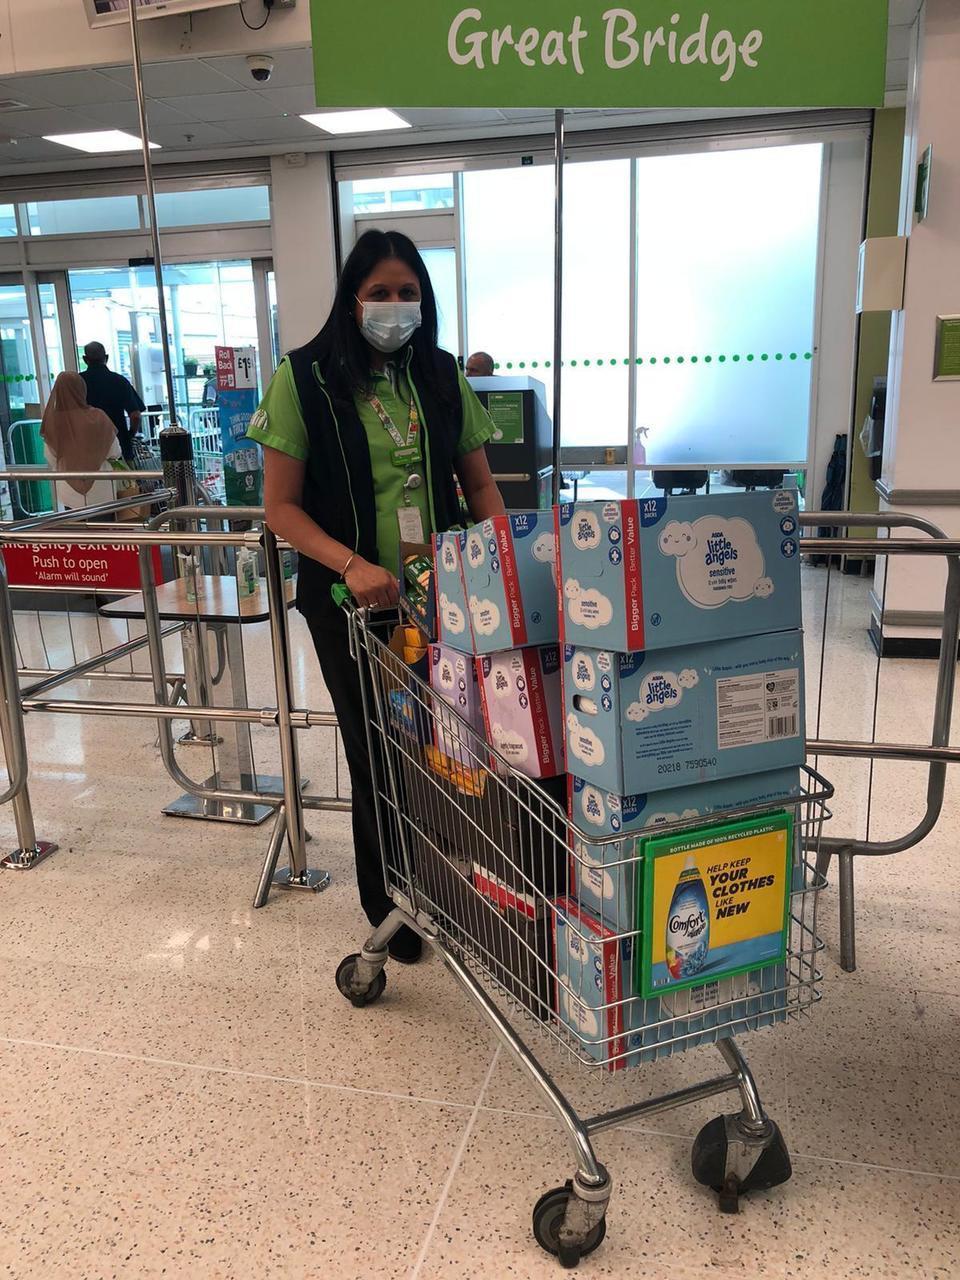 Donation toBlack Country Women's Aid | Asda Great Bridge